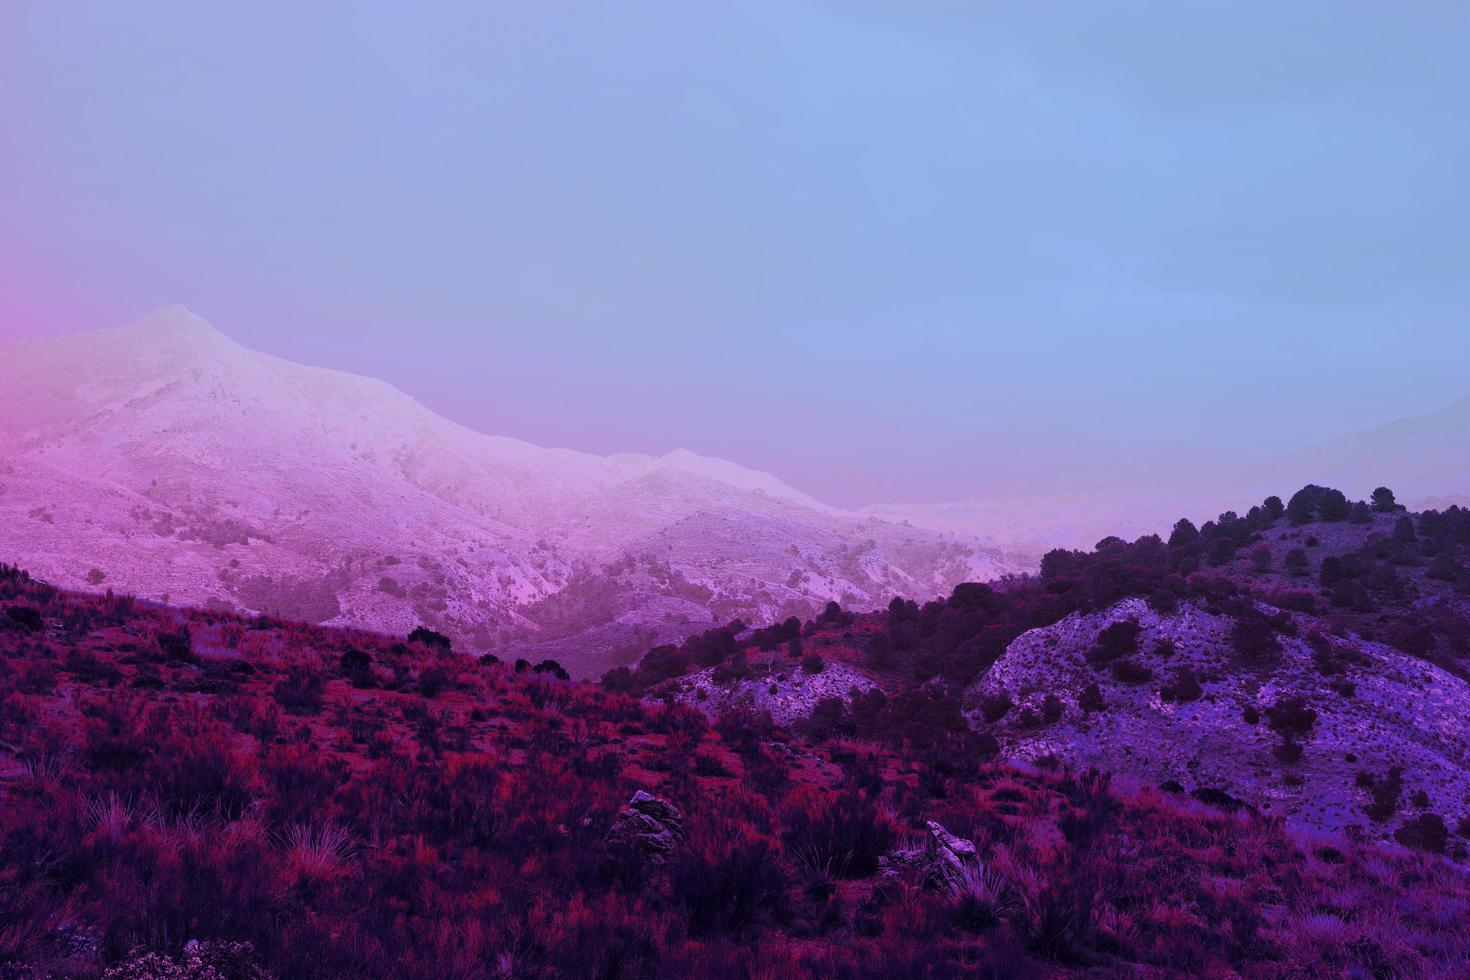 Aesthetic retro vaporwave landscape photo